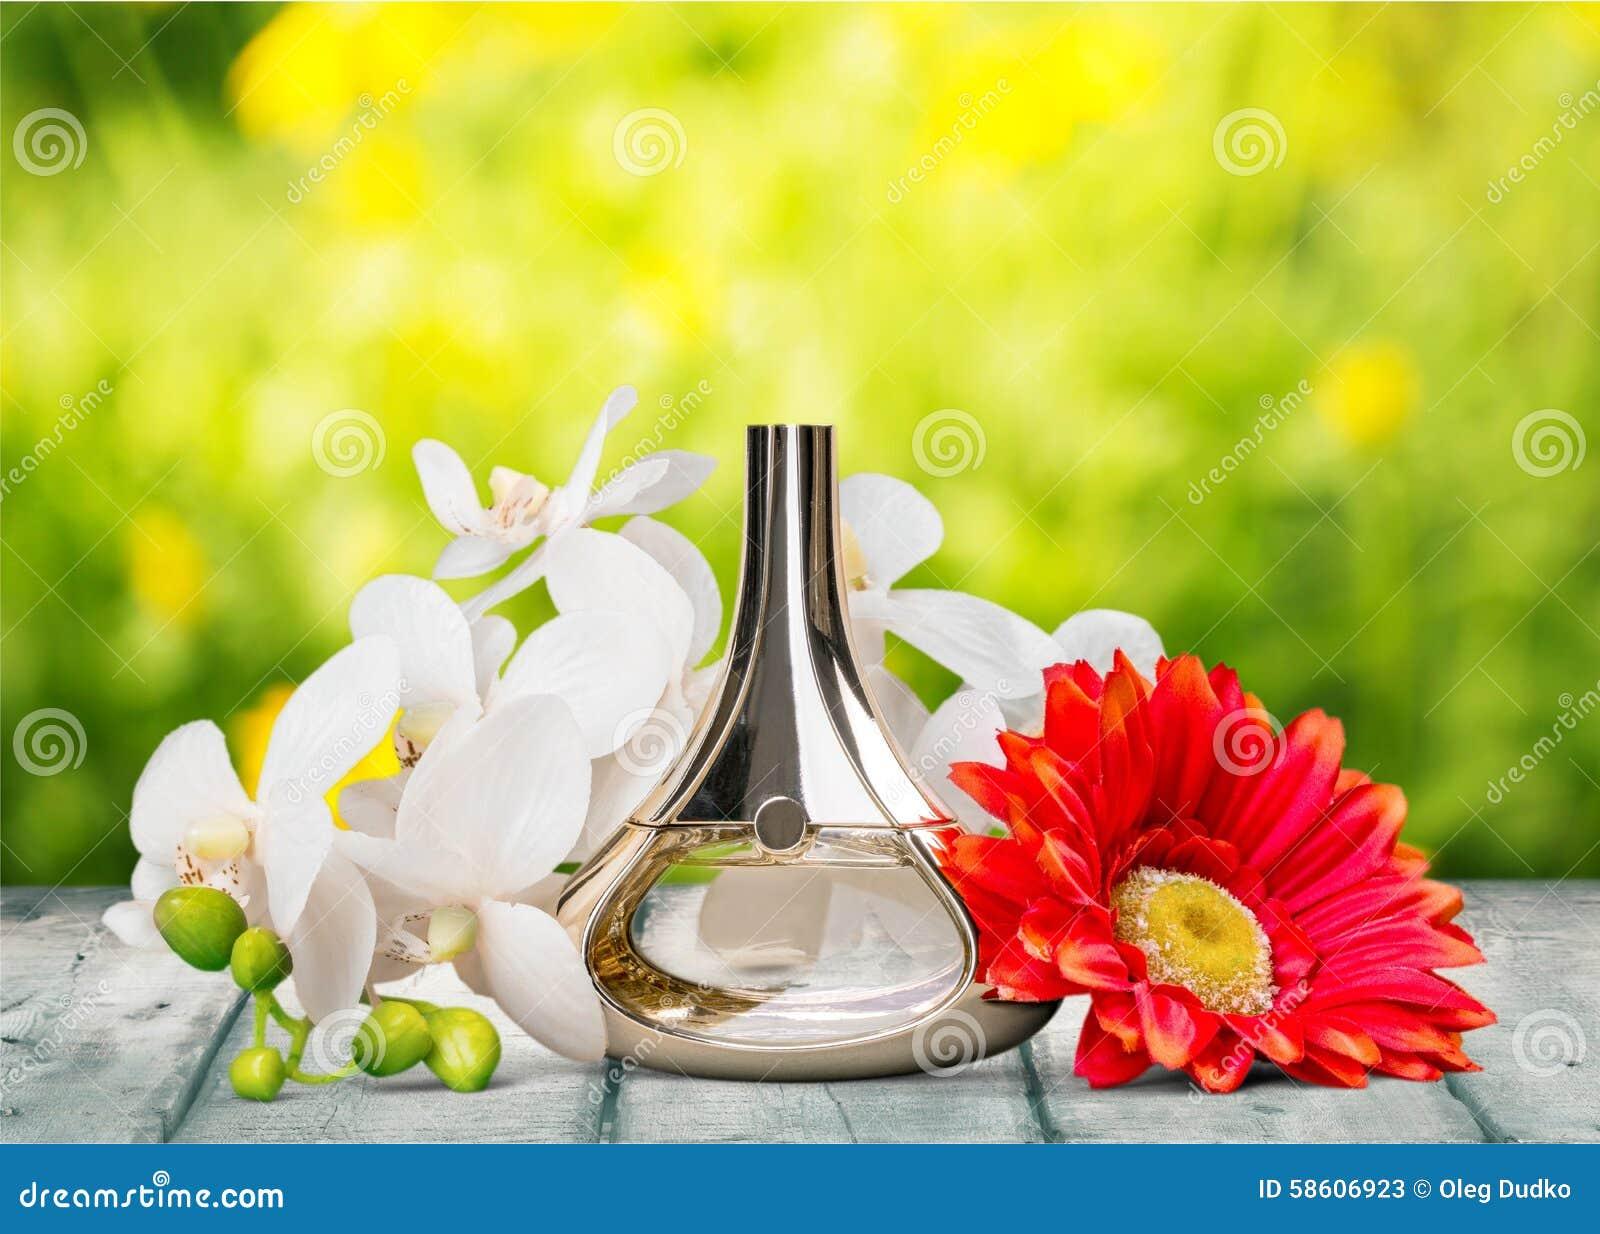 Perfume Stock Photo Image 58606923